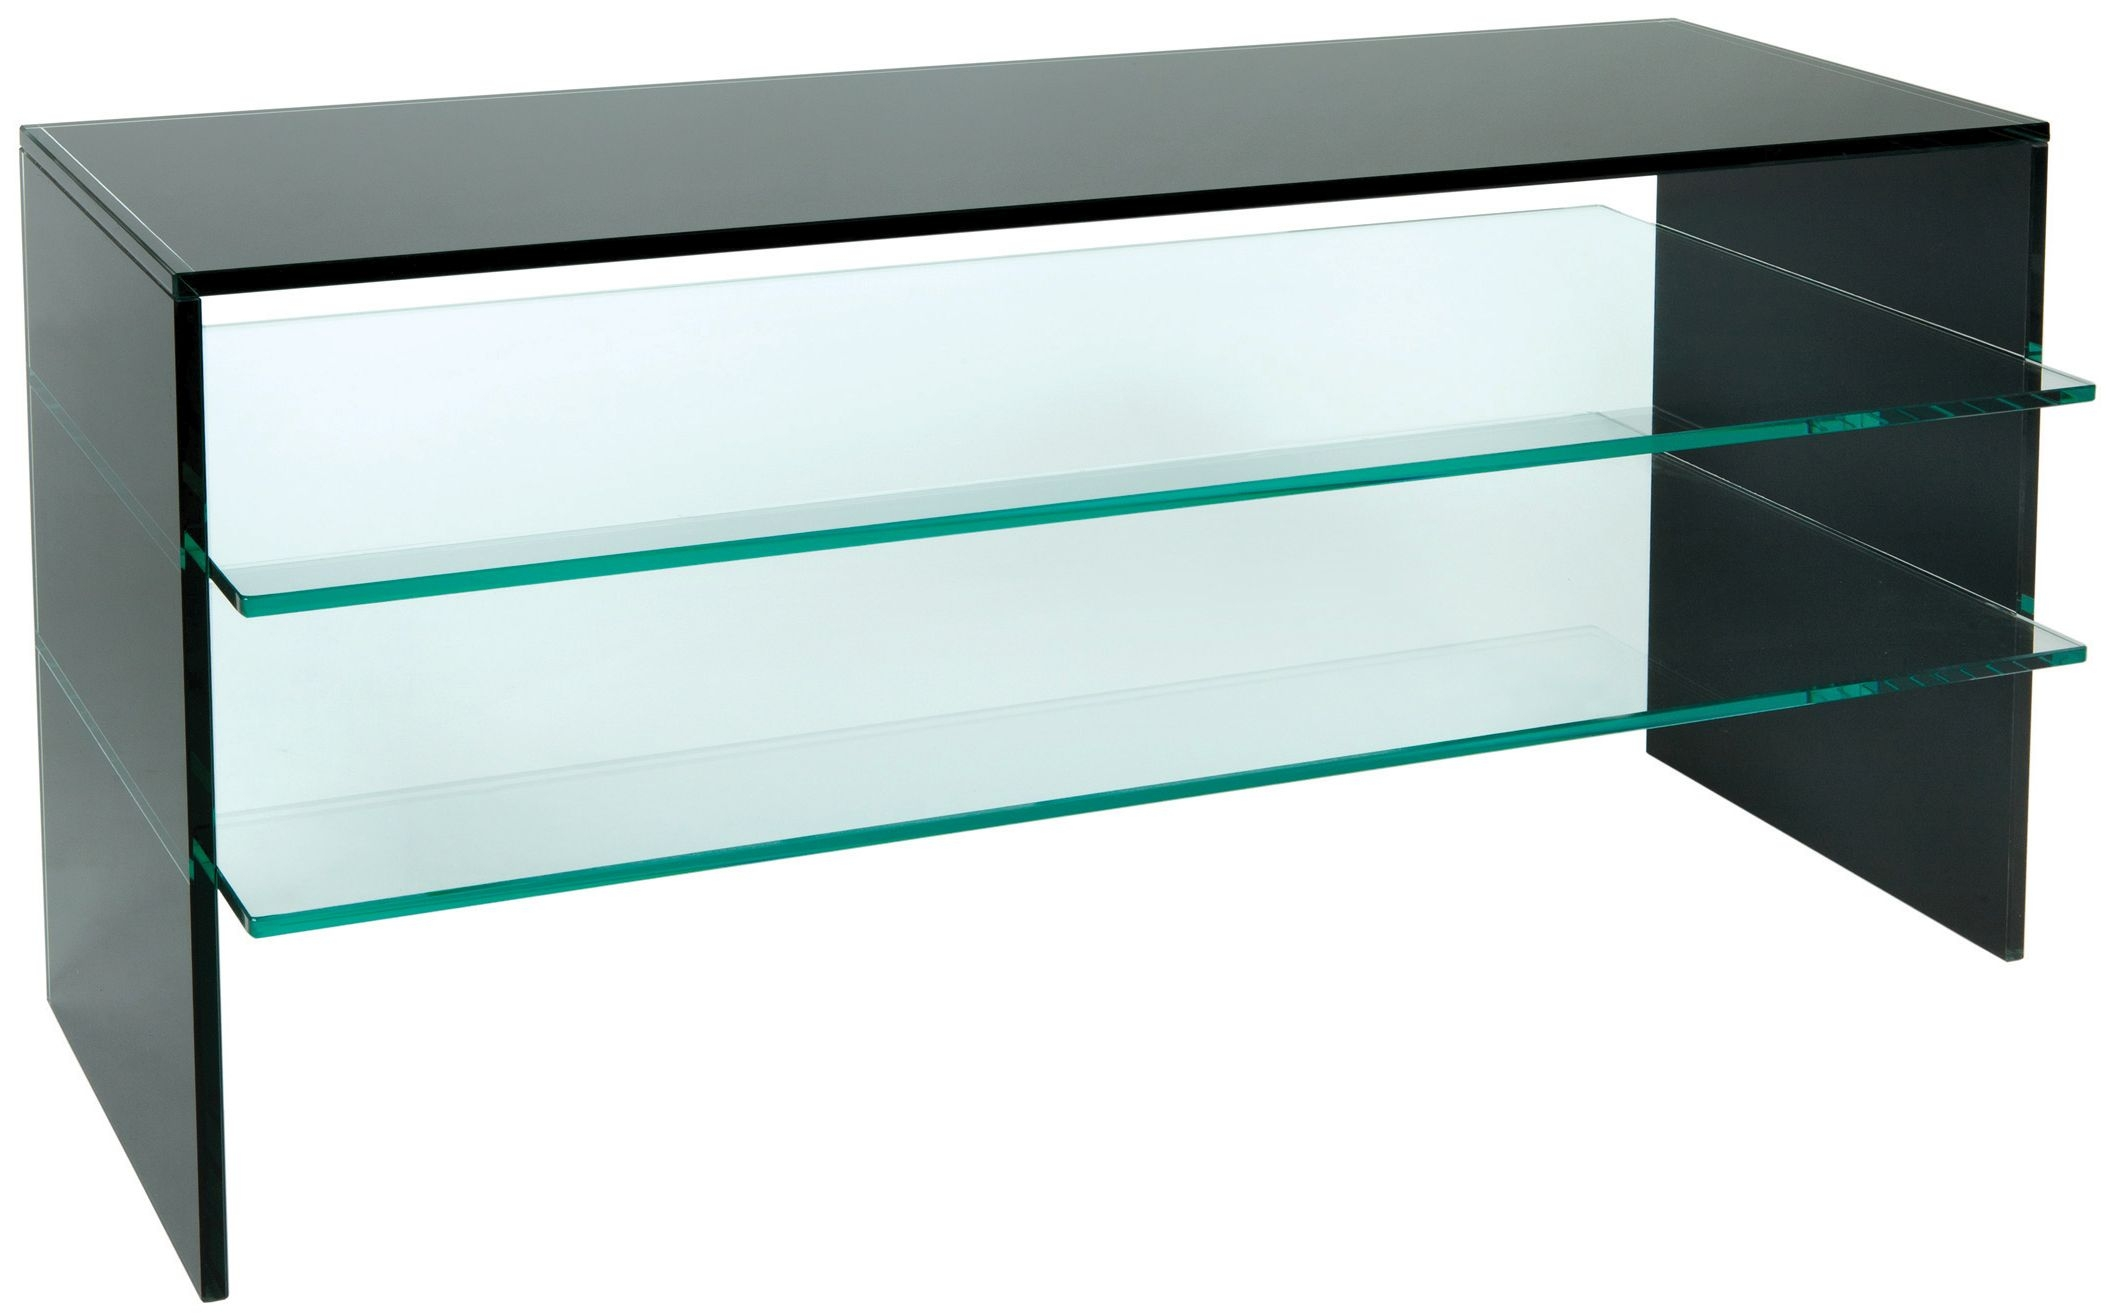 Greenapple Pure Glass Plasma TV Stand - Black 59225ZW